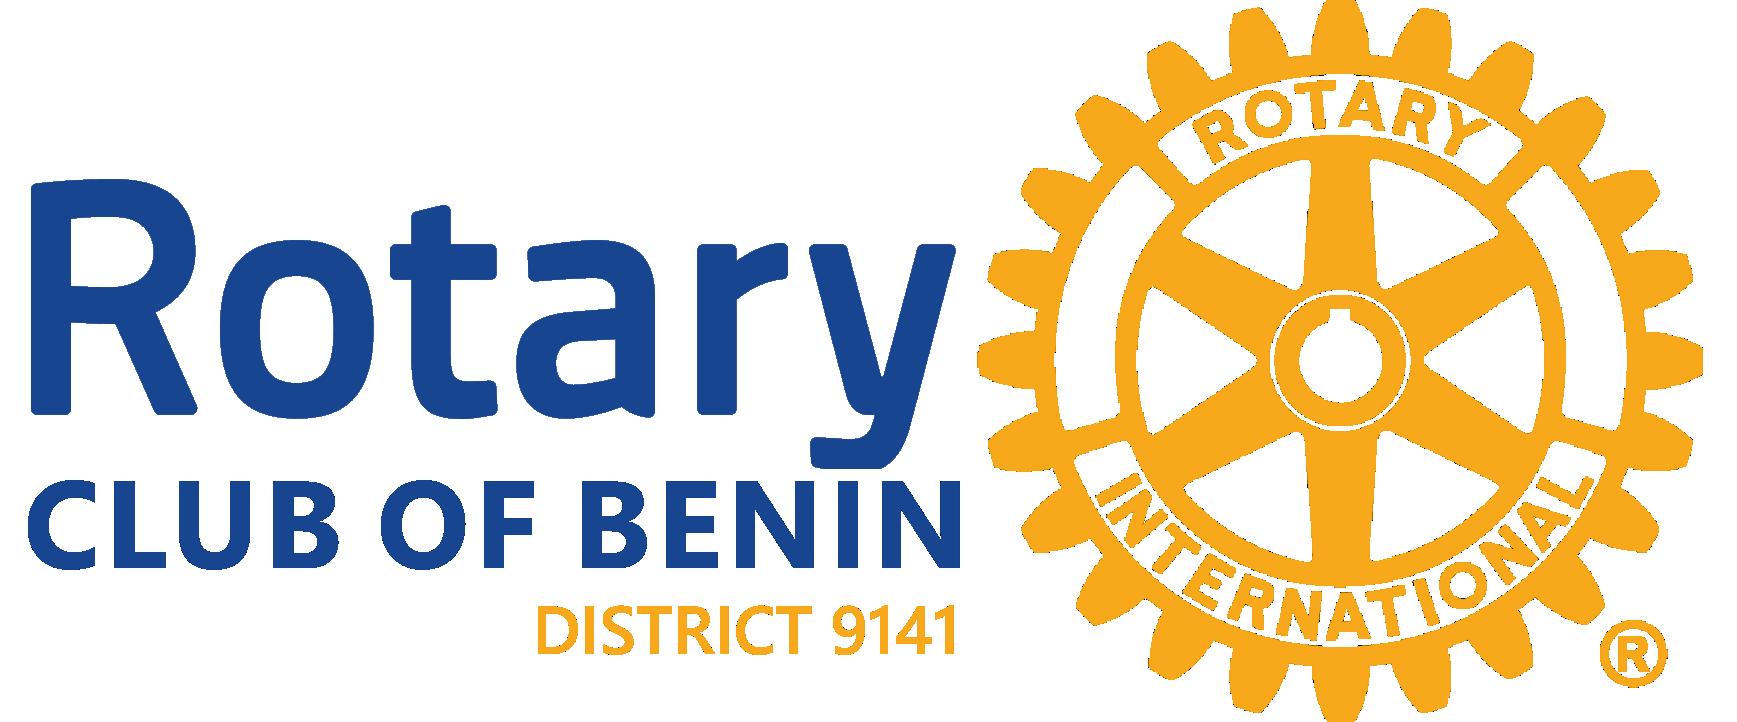 Rotary Club of Benin